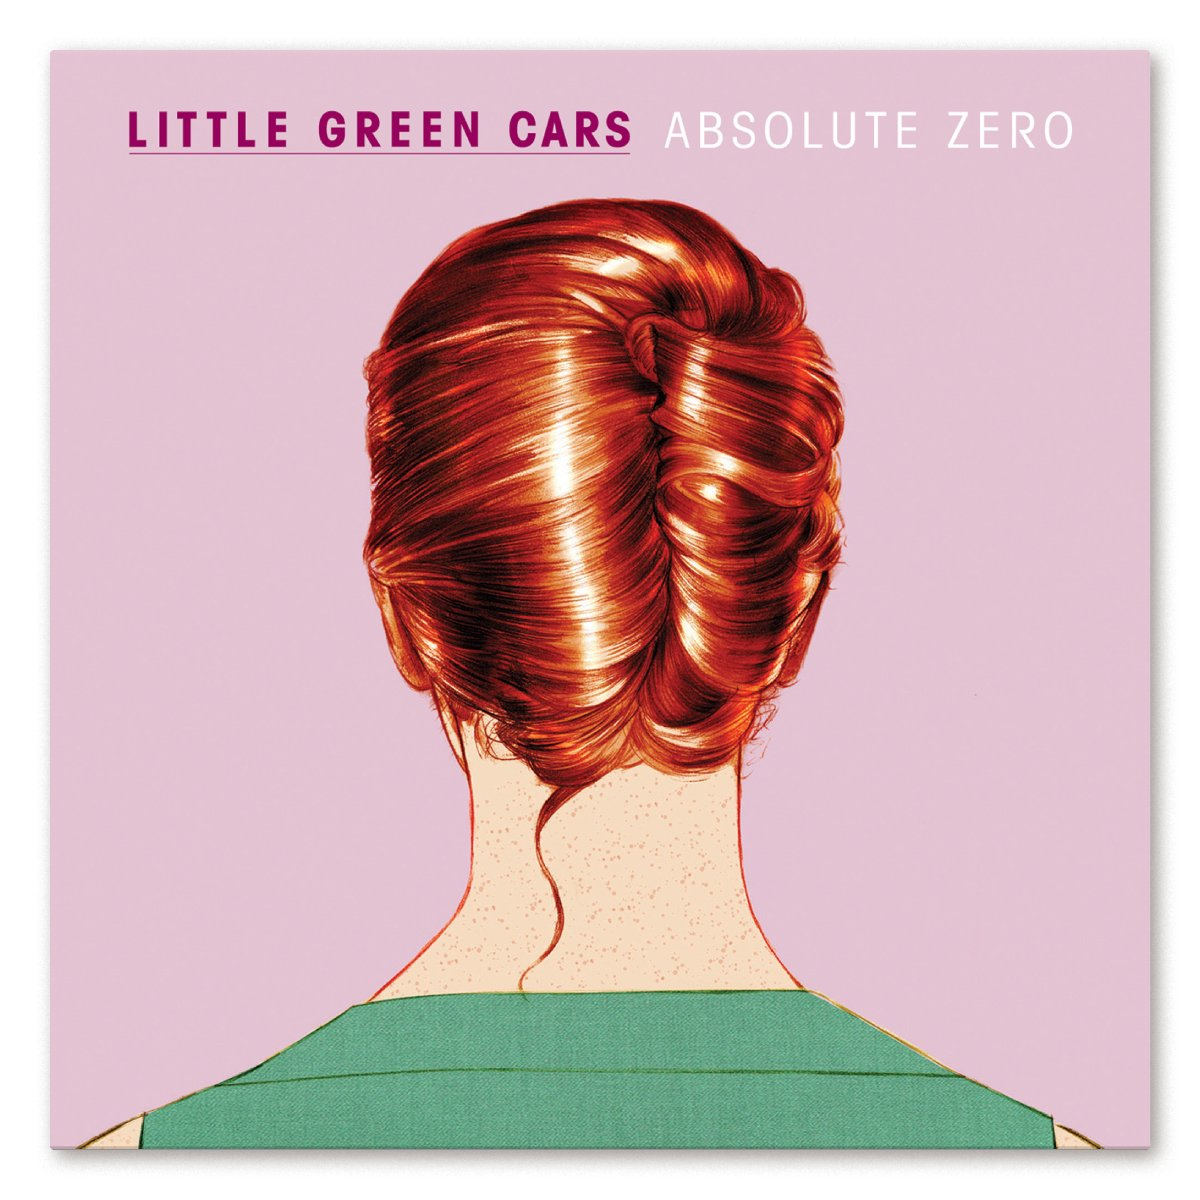 Absolute Zero; Little Green Cars; Glassnote (2013); Design: Slater Design; Illustrations by Steve Doogan